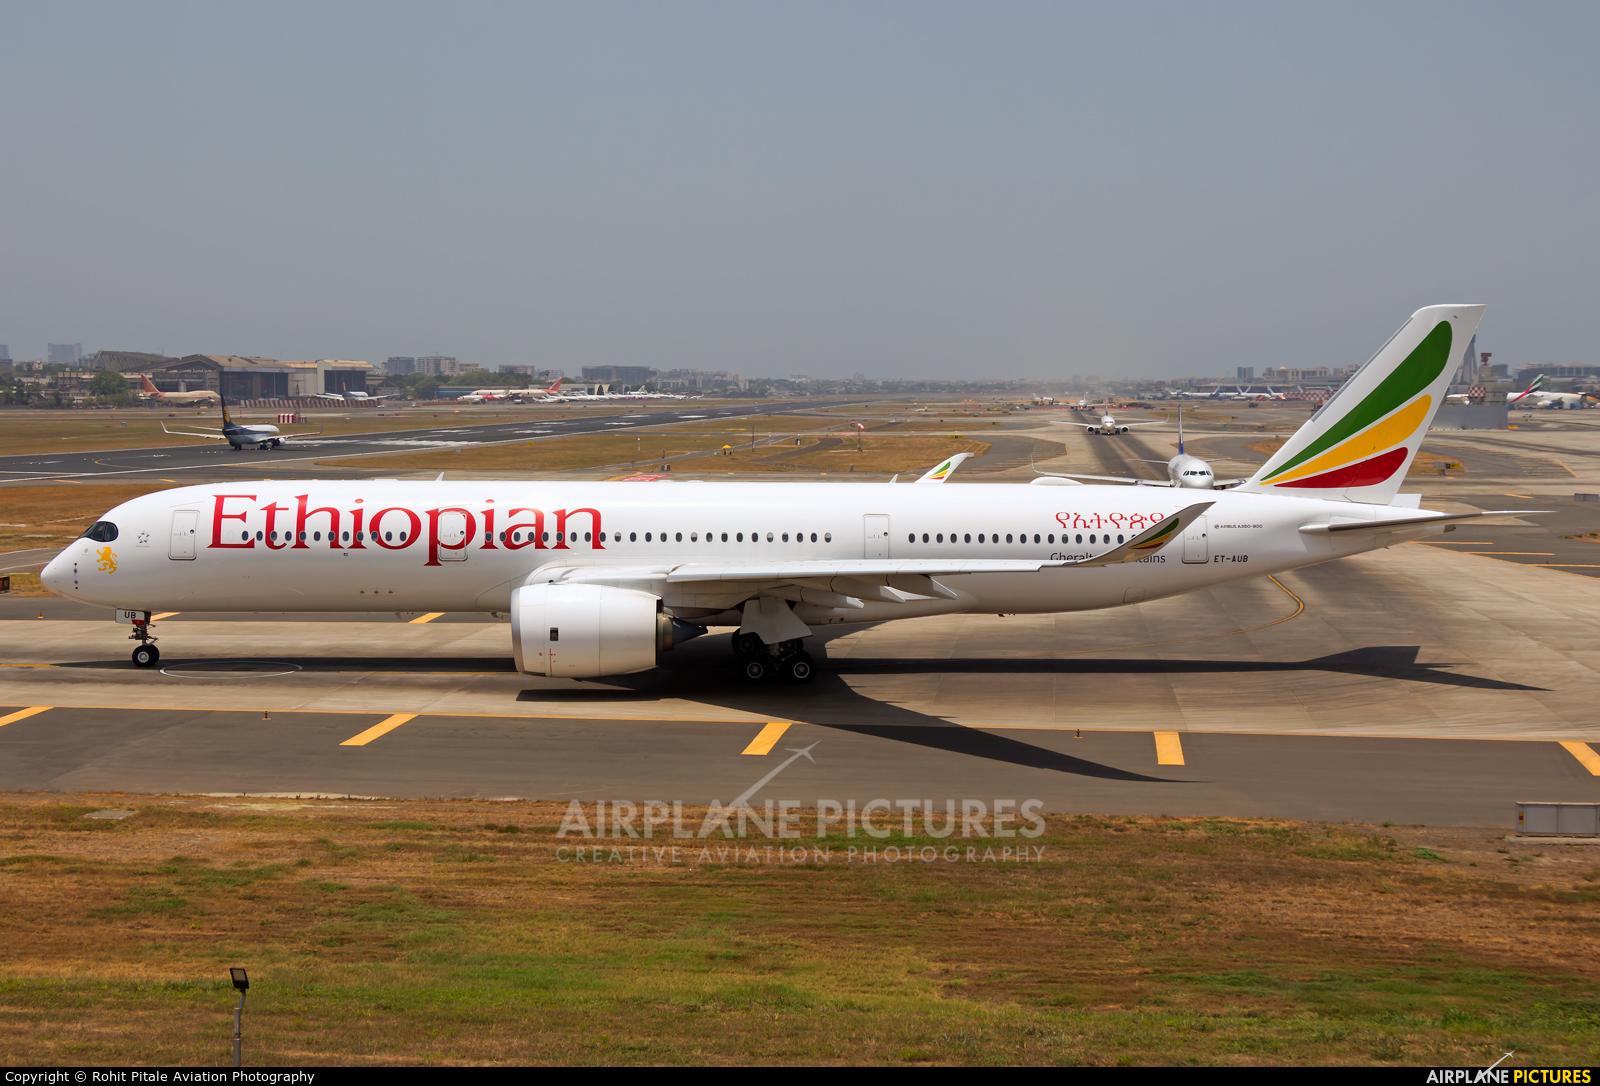 Ethiopian Airlines ET-AUB aircraft at Mumbai - Chhatrapati Shivaji Intl